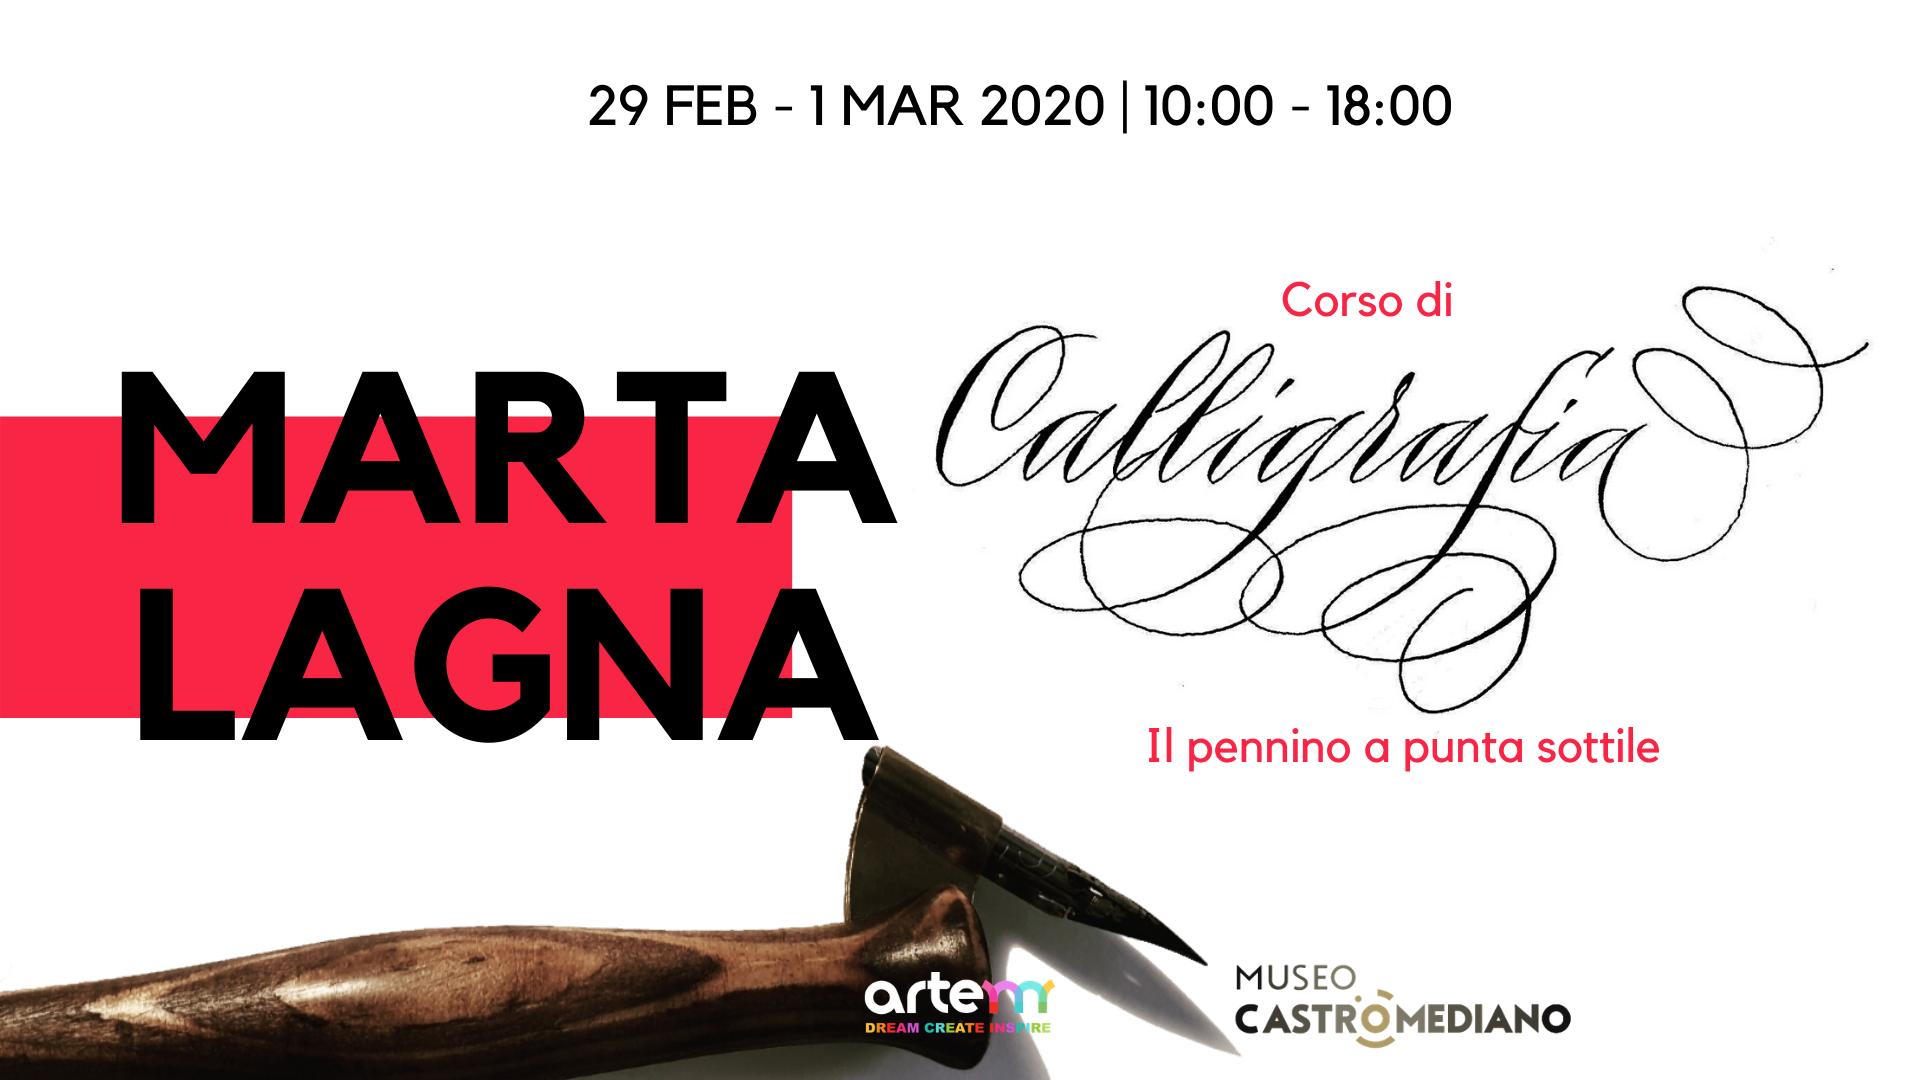 CALLIGRAFIA_COWORKING_ARTEM